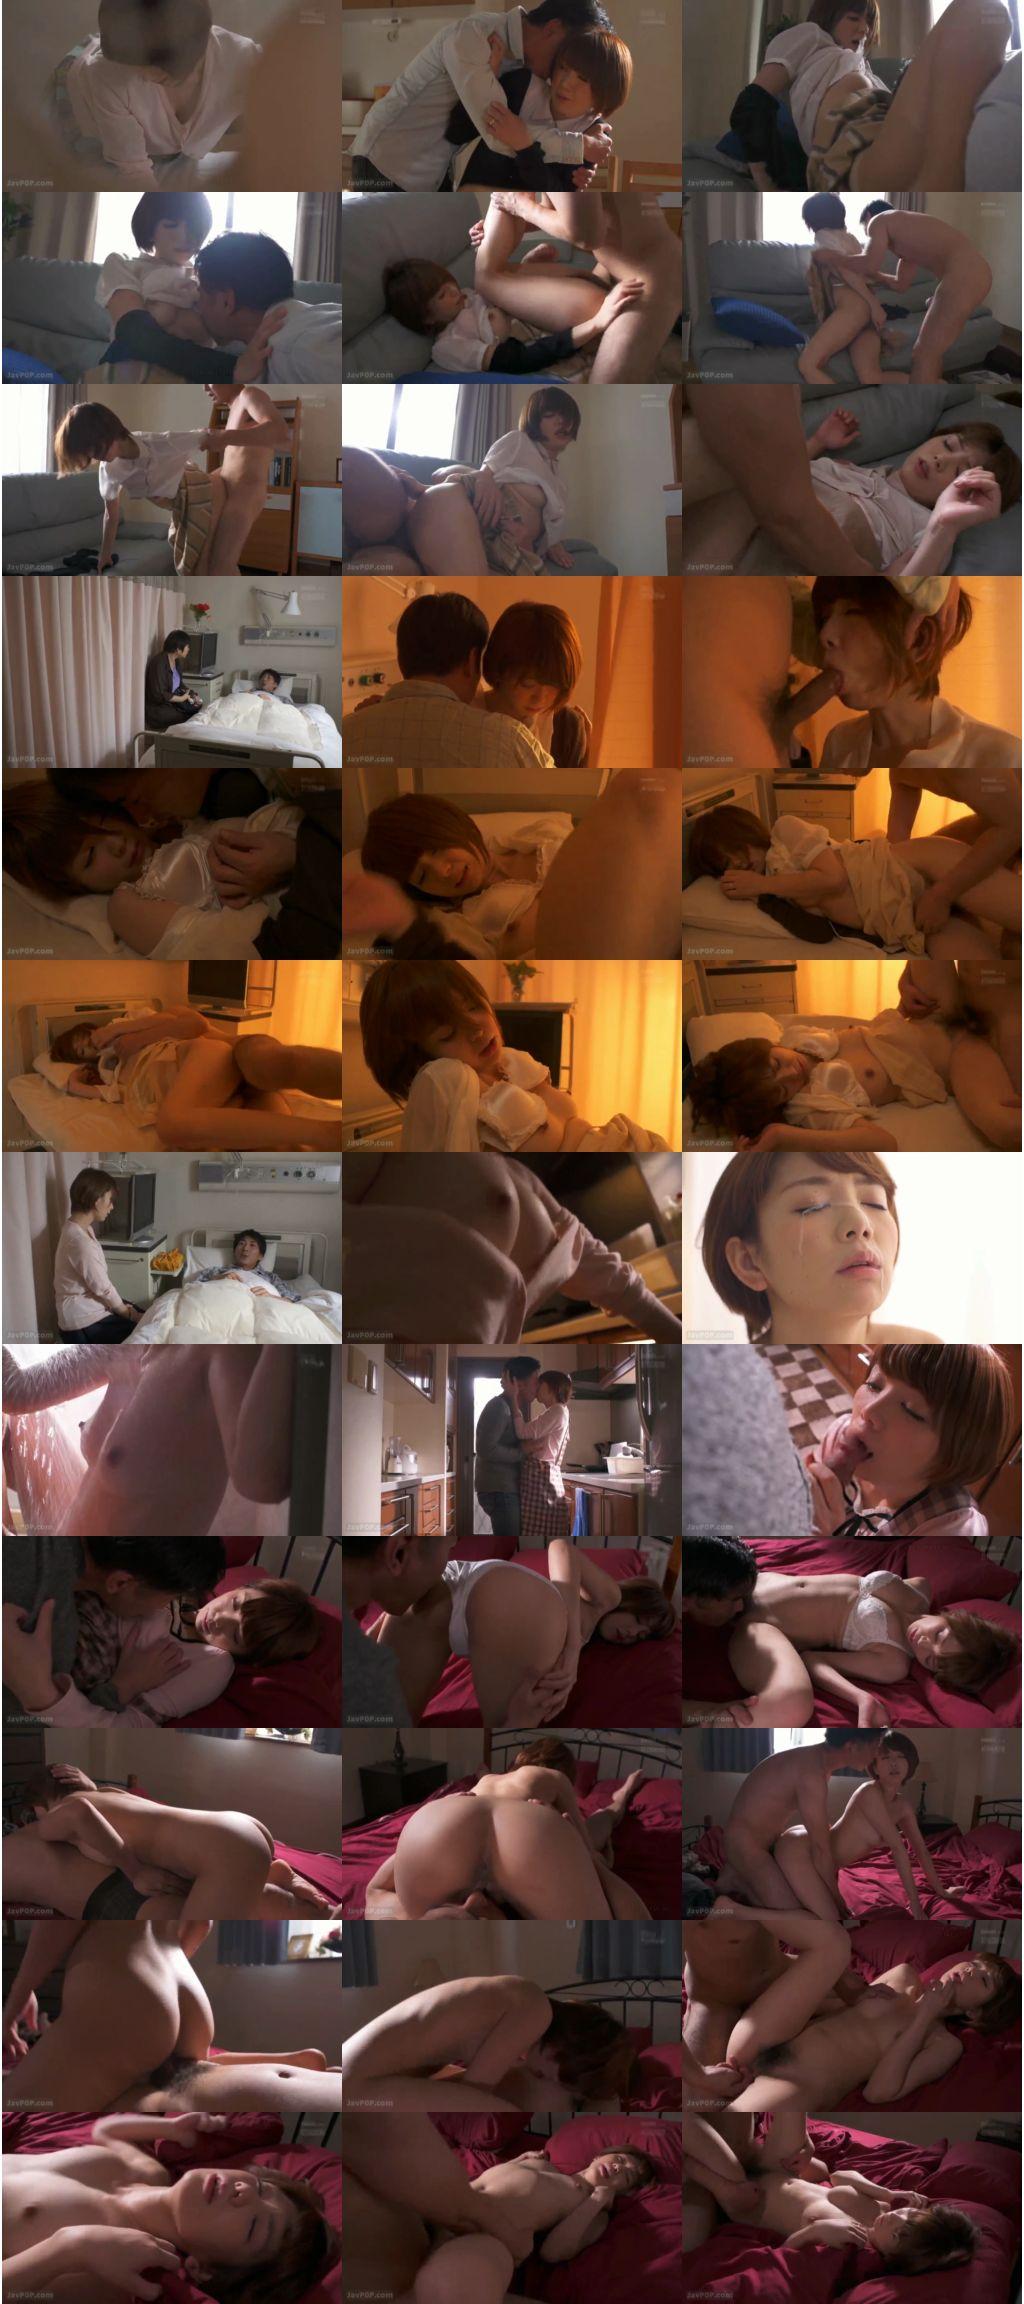 adn 089 s - [ADN-089] あなた、許して…。-嘘から始まる姦計2- 希美まゆ なぎら健造 Otona No Drama Nozomi Mayu アタッカーズ Nagira Kenzo